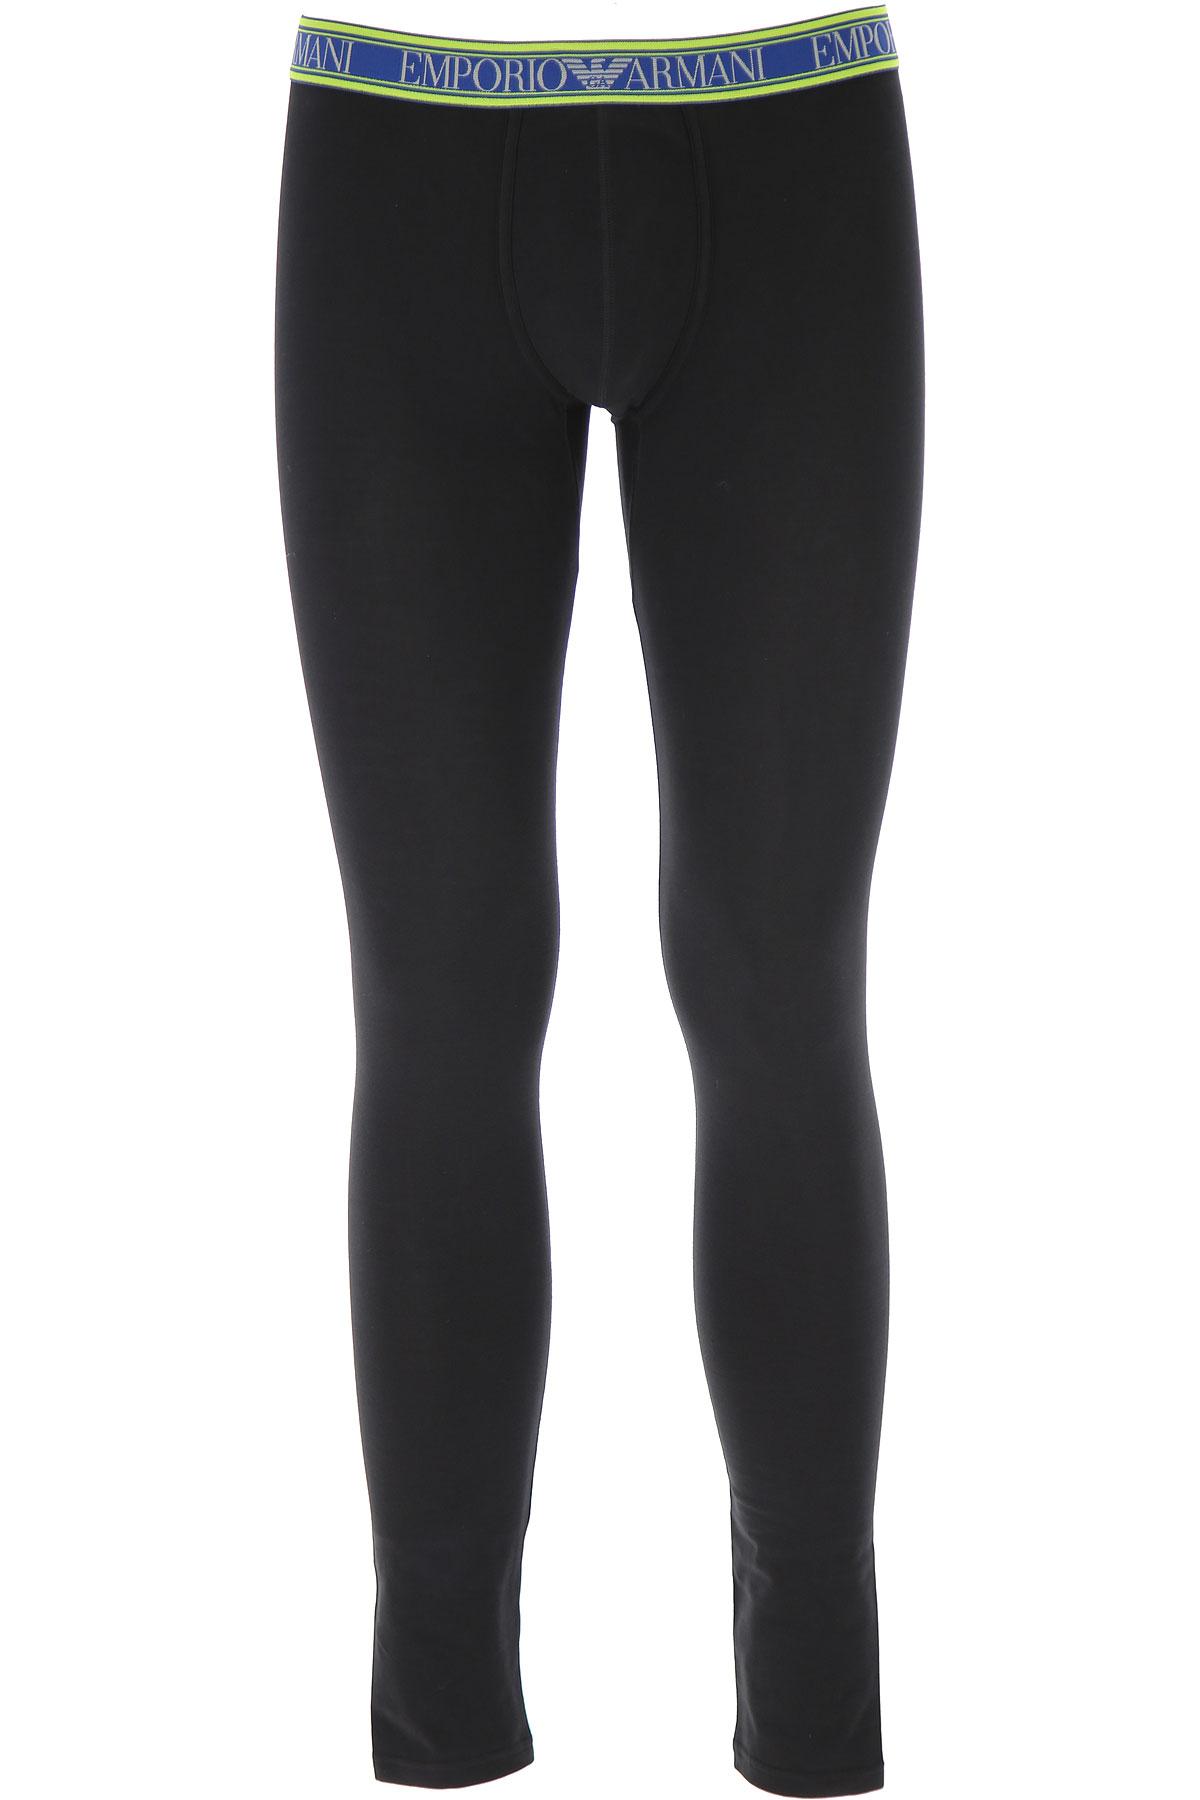 Emporio Armani Loungewear for Men, Black, Cotton, 2019, L (IT 5) XL (IT 6)